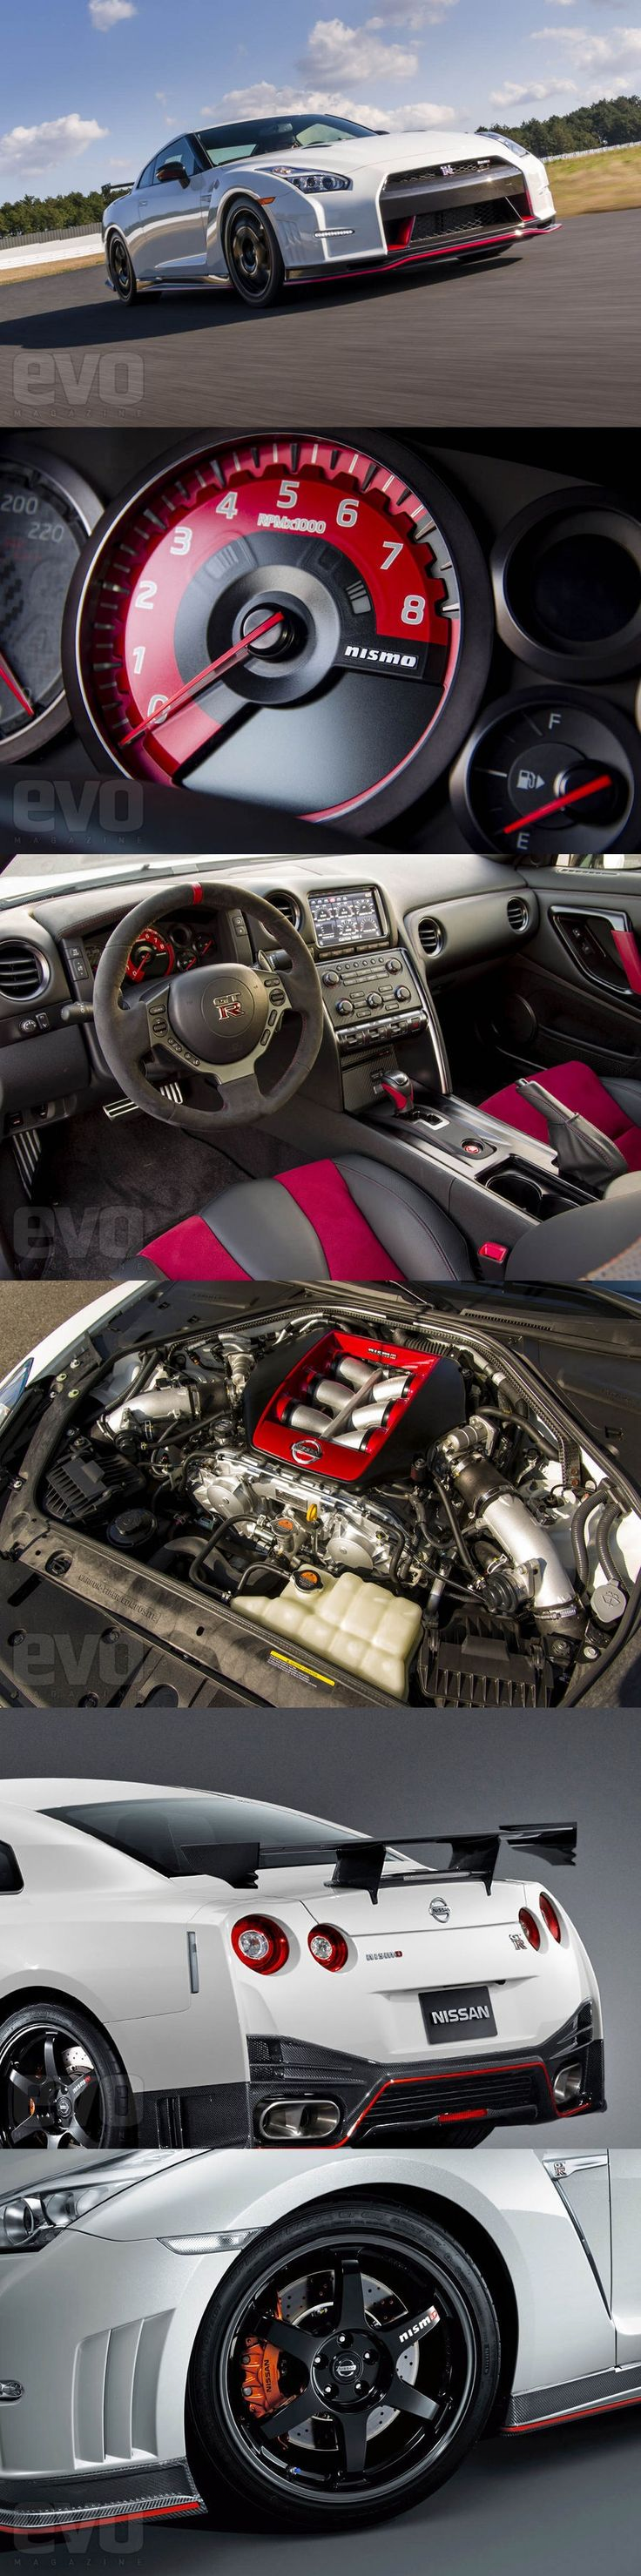 Nissan GT-R Nismo                                                       …